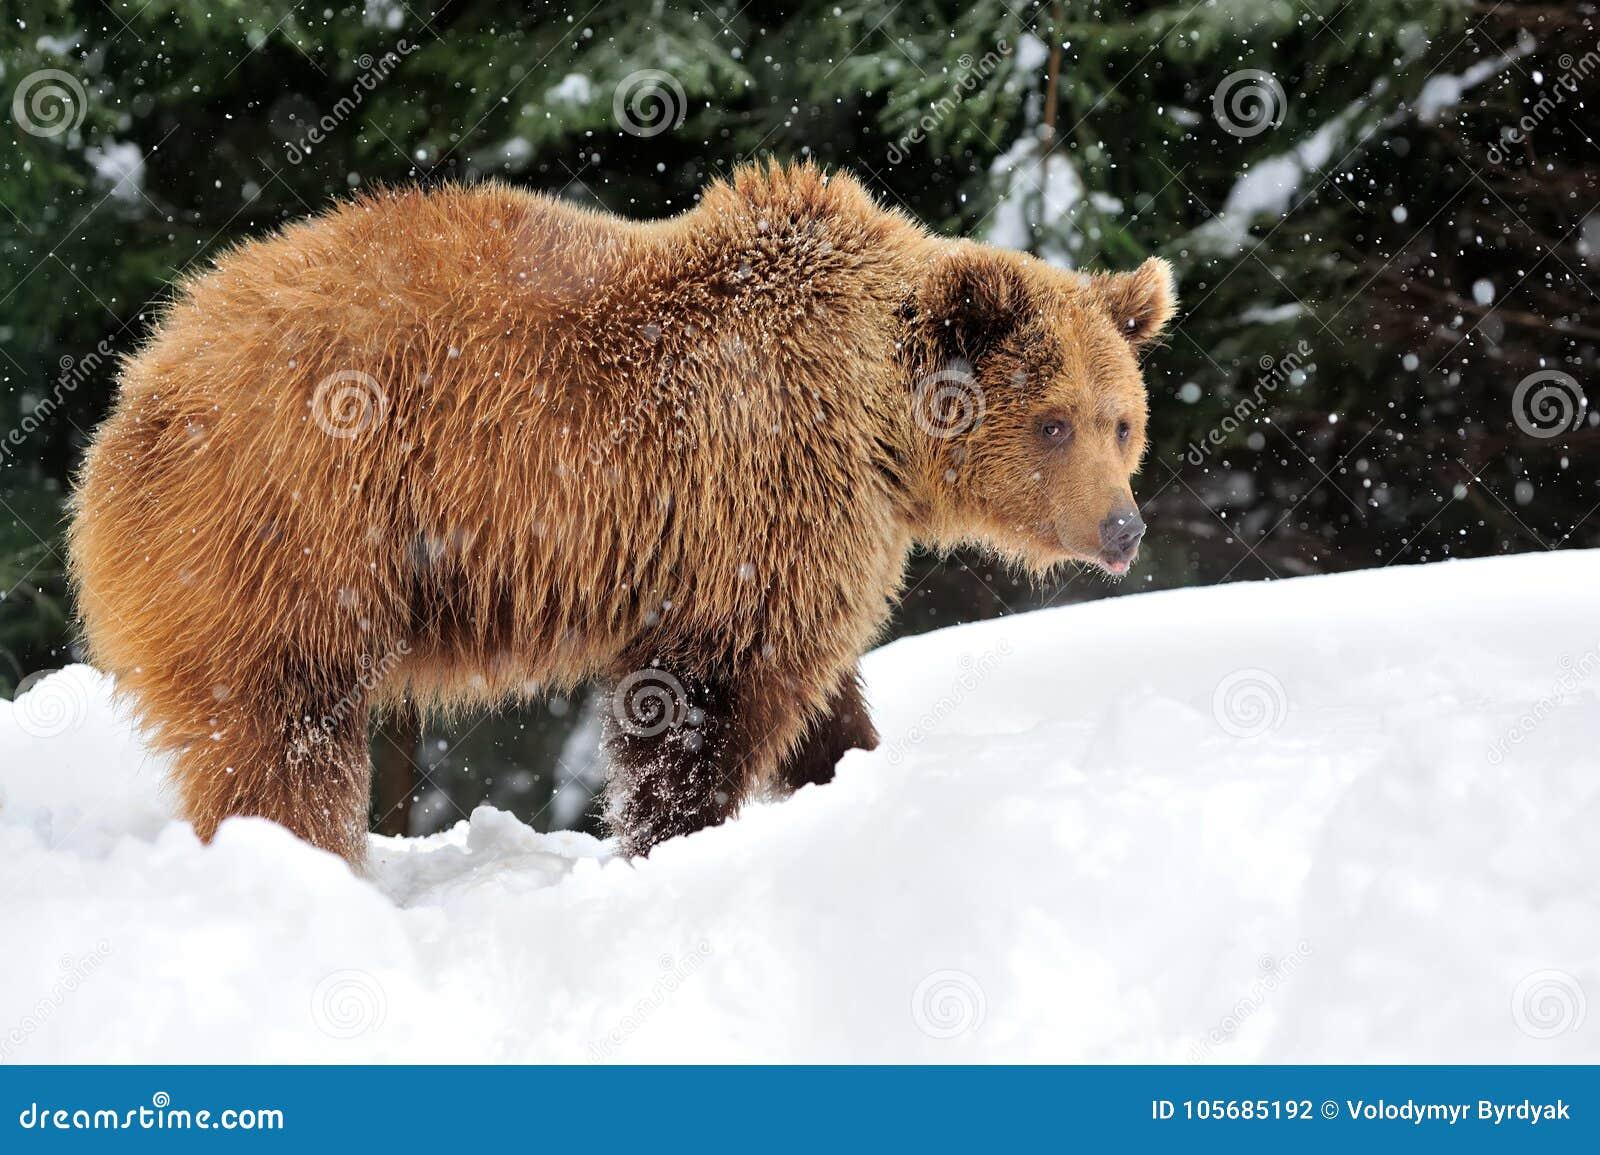 bear in winter time stock photo image of arctic huge. Black Bedroom Furniture Sets. Home Design Ideas